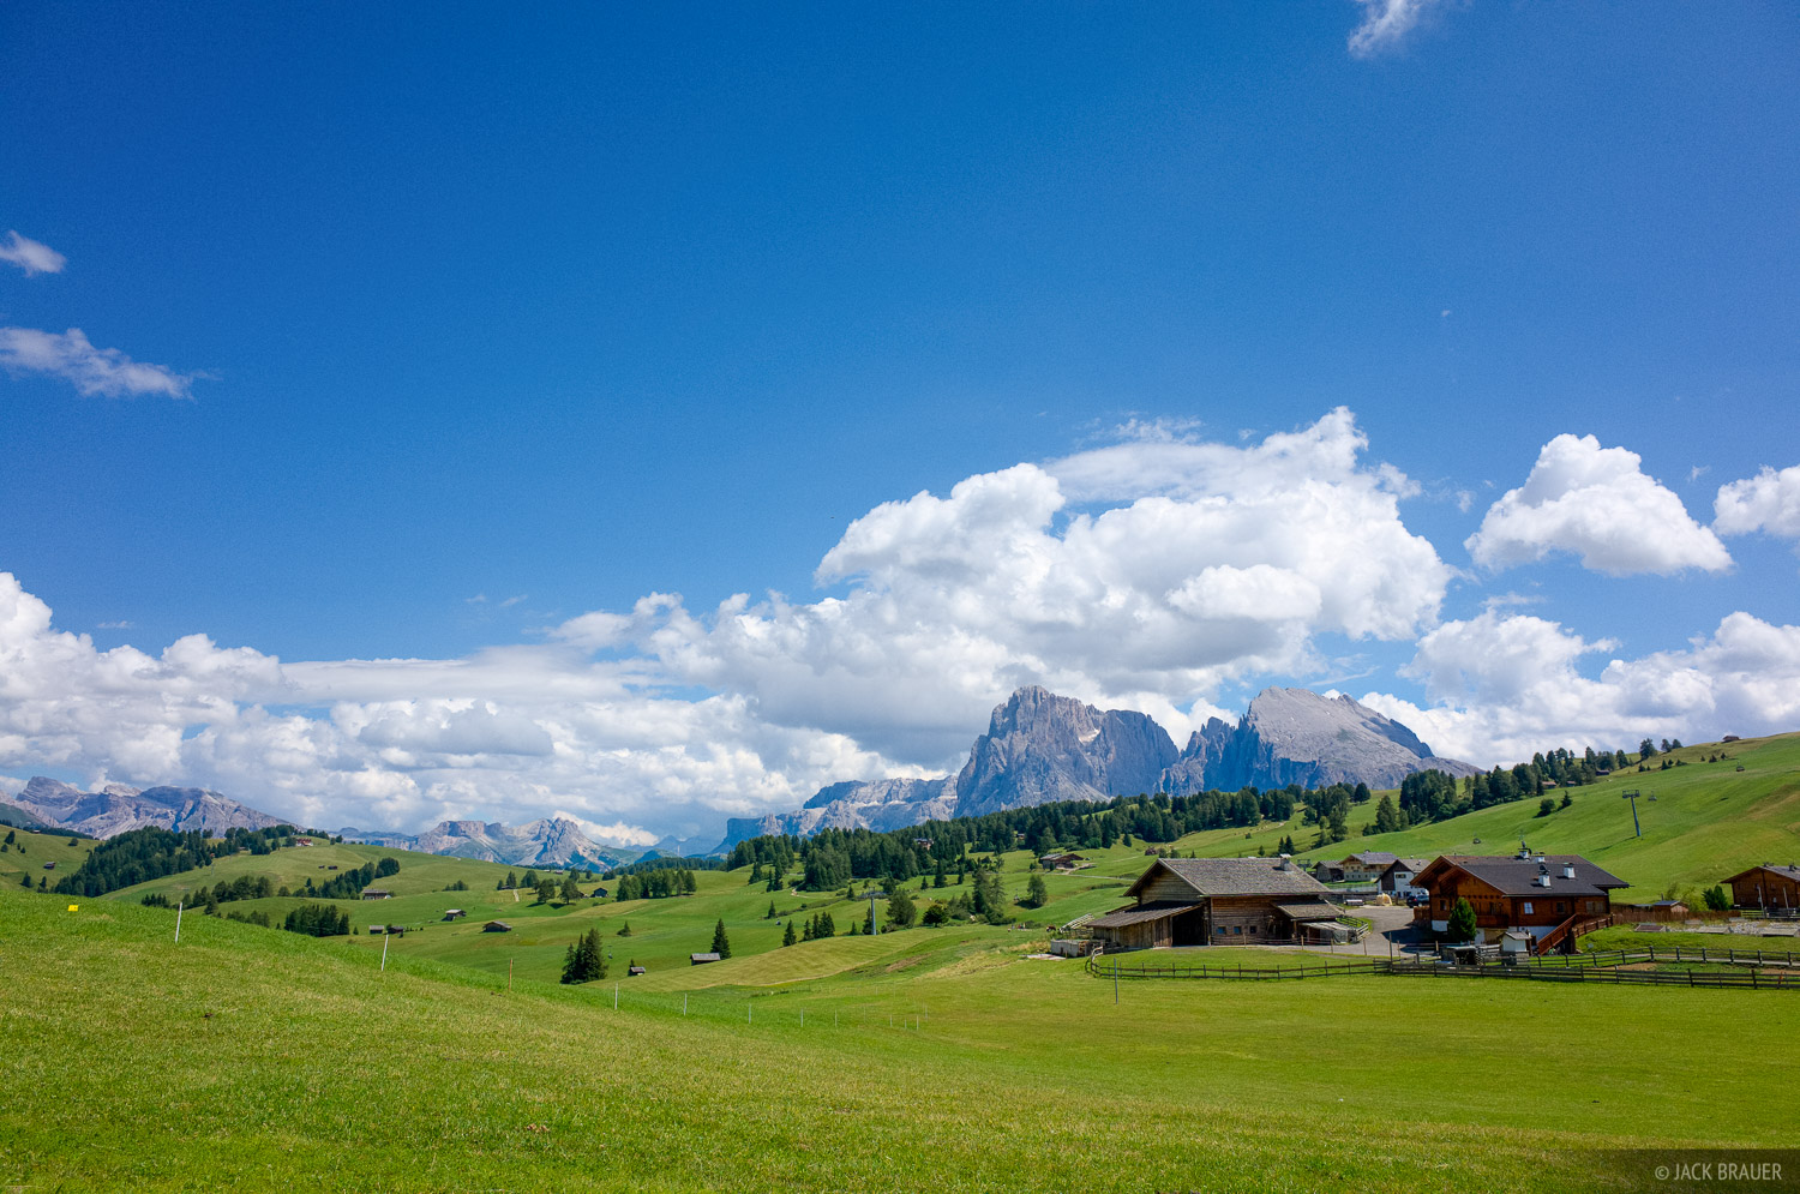 Alpe di Siusi, Dolomites, Italy, Rosengarten, Alps, photo